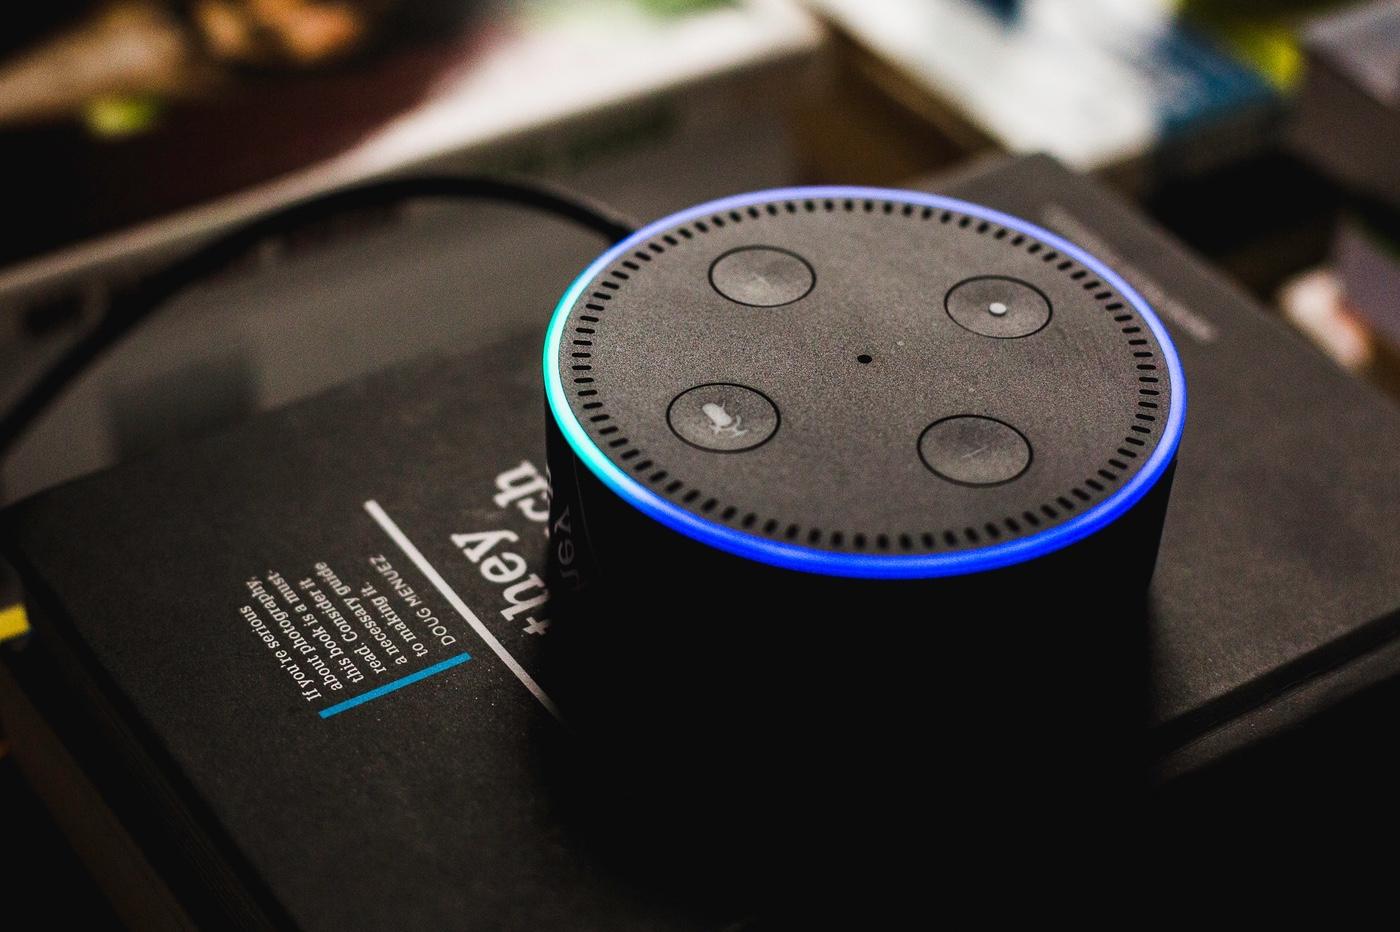 enceinte Amazon avec Alexa